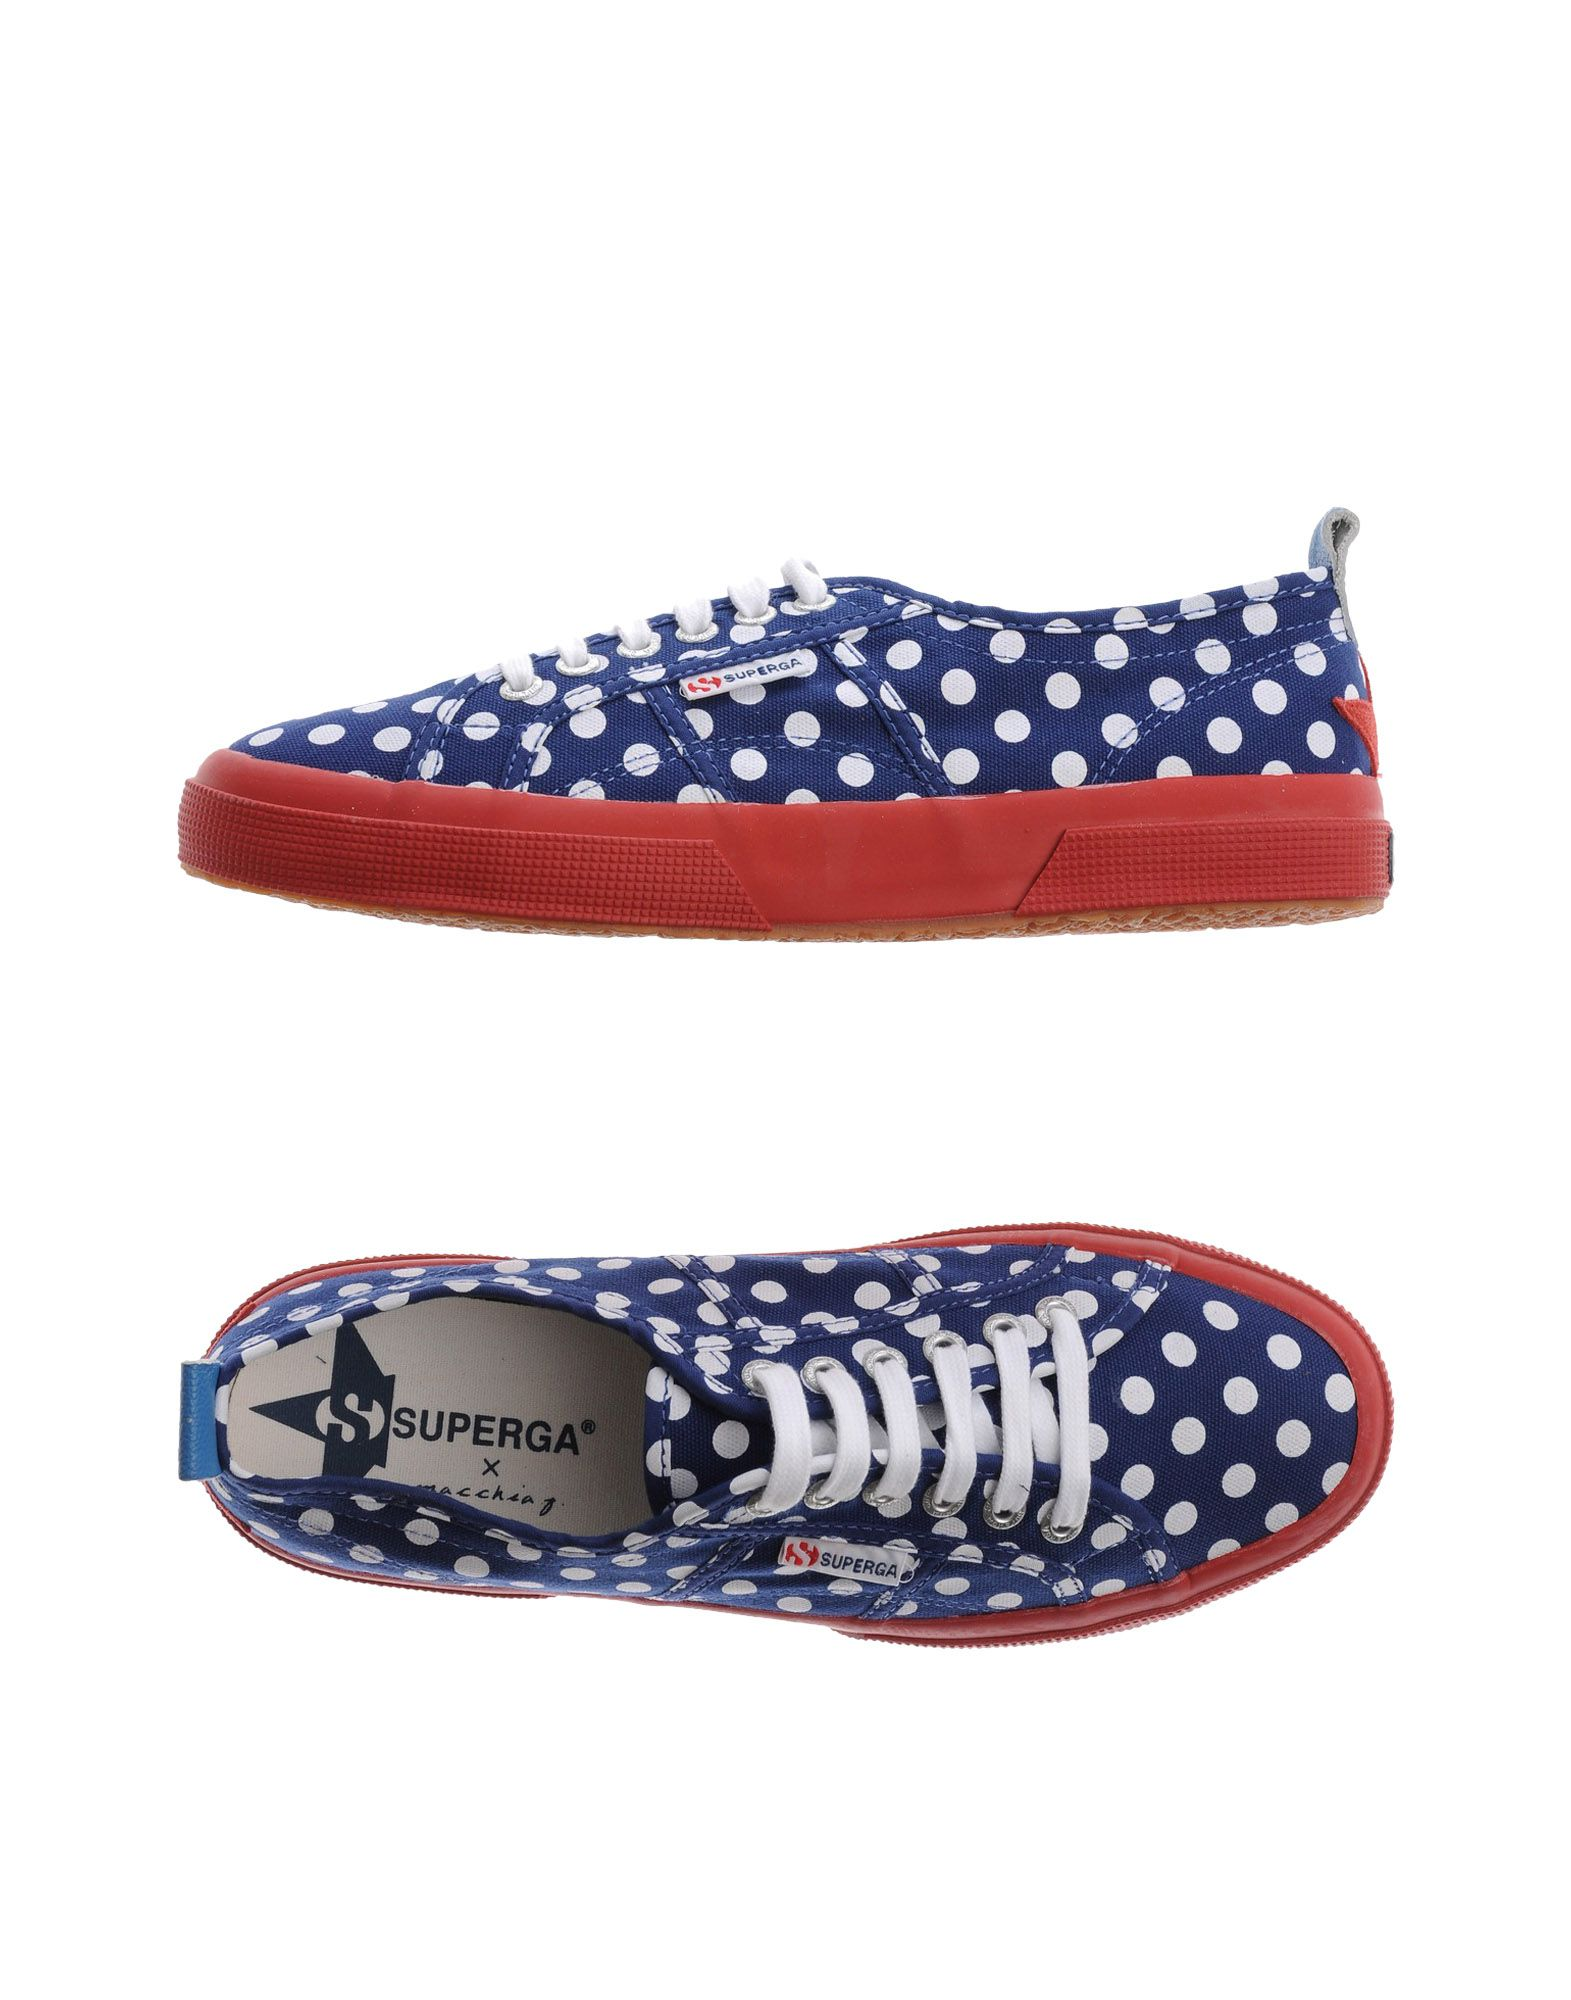 Superga® Per Macchia J Herren Sneakers Herren J  11240419RX Heiße Schuhe 2b16bf